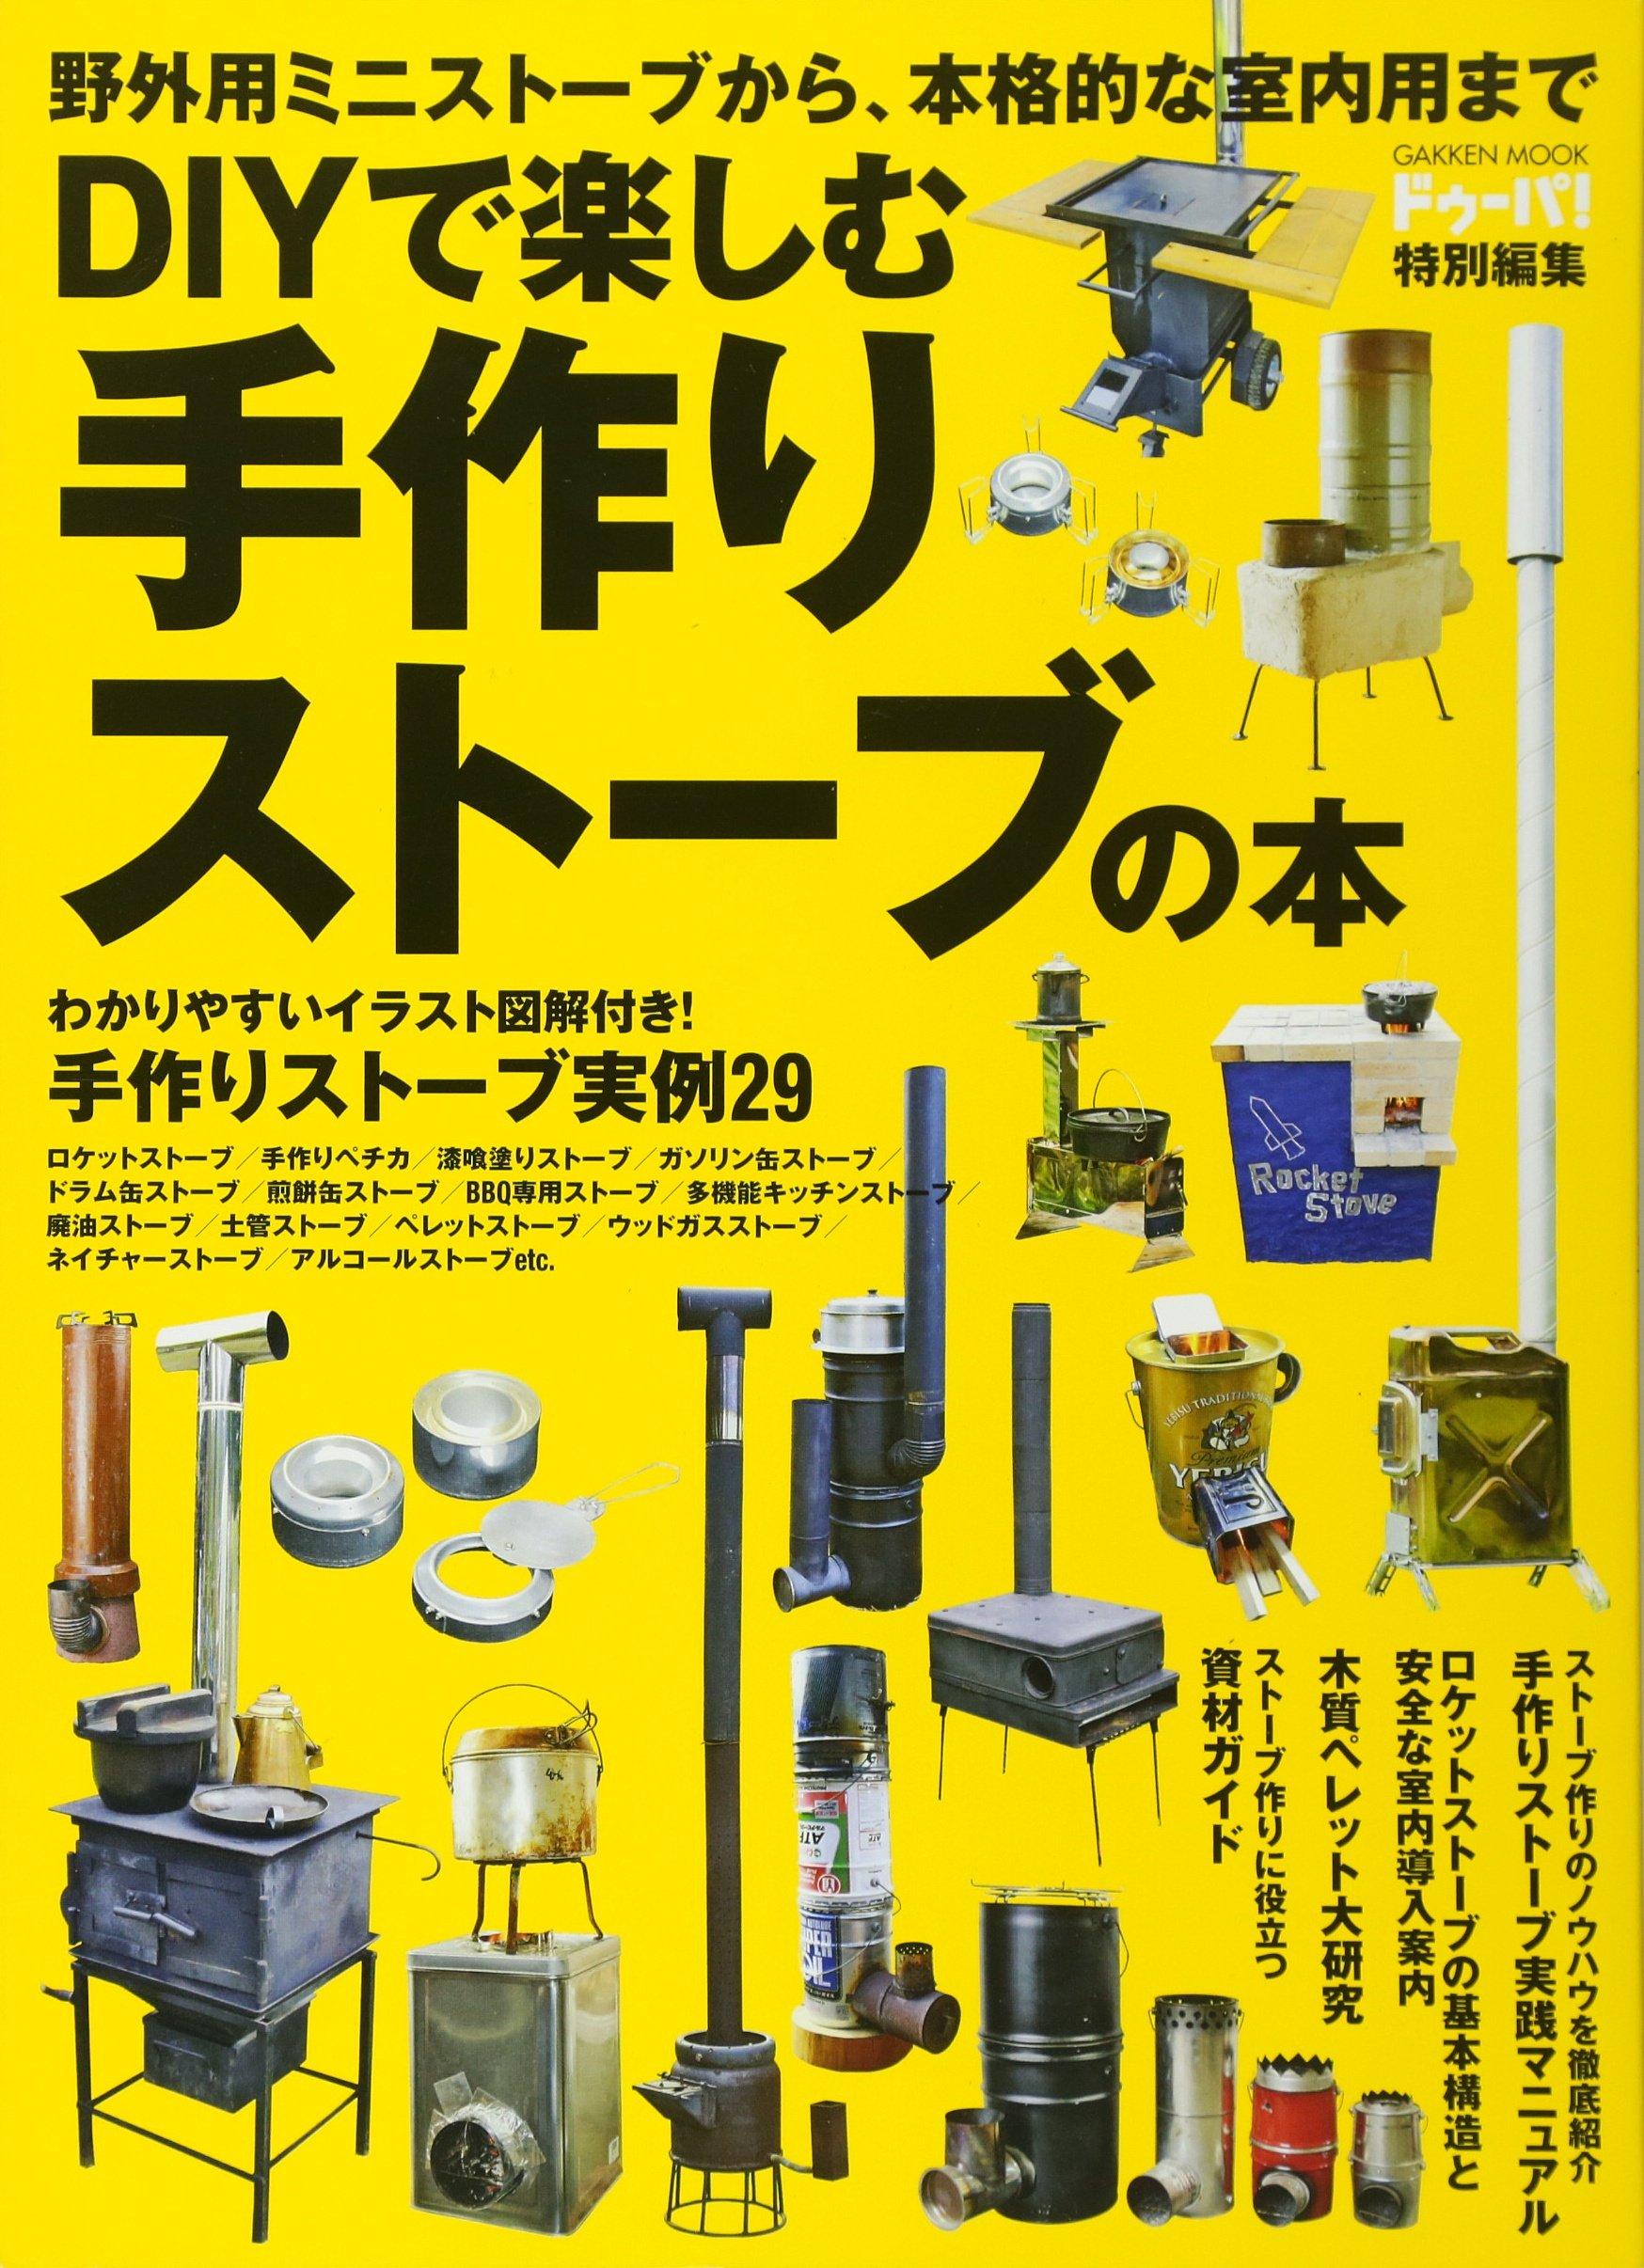 『DIYで楽しむ 手作りストーブの本』(学研プラス)